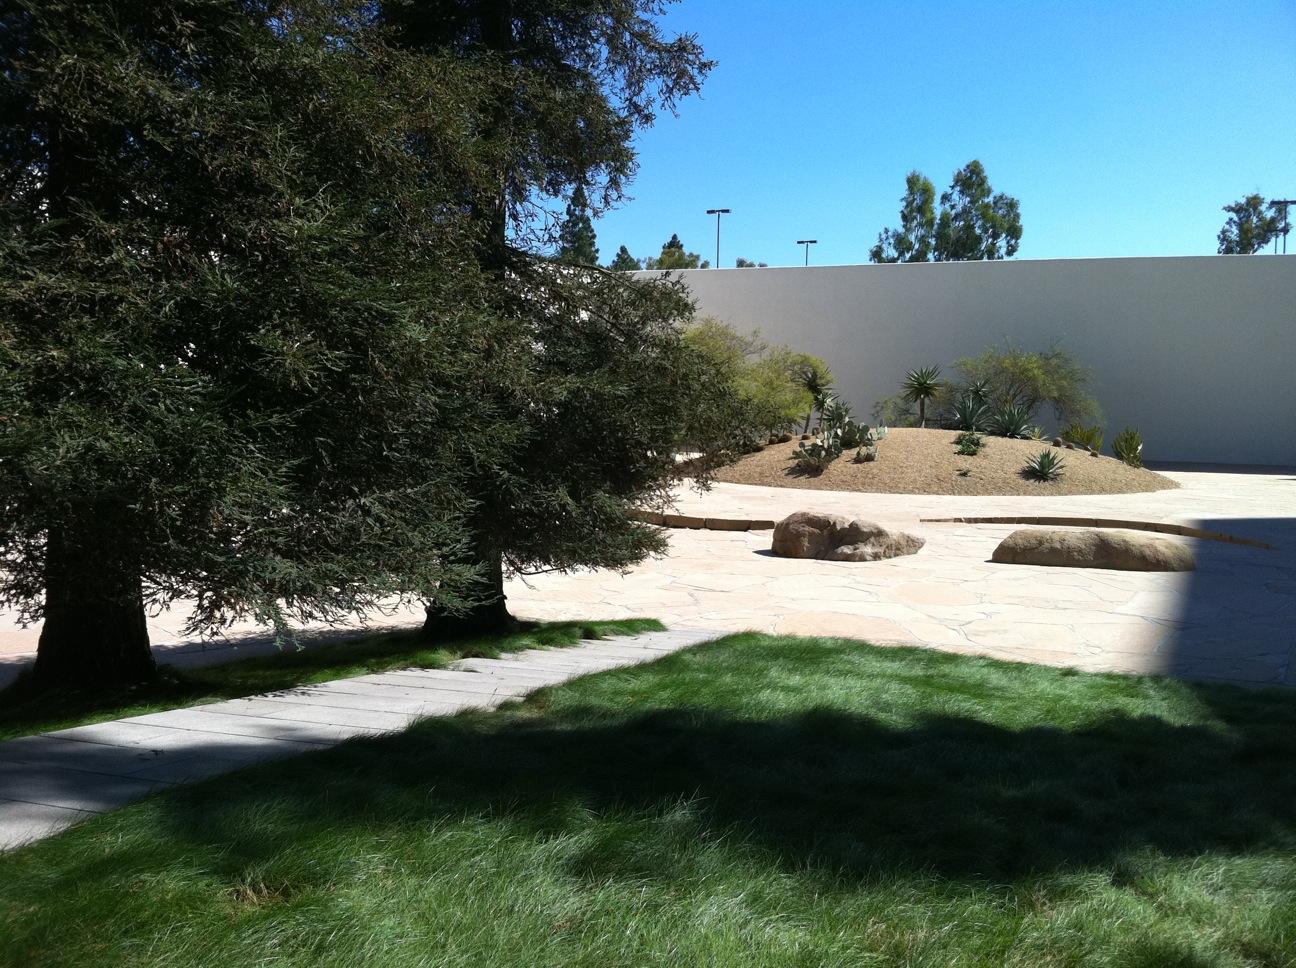 365 Things To Do In Costa Mesa Noguchi Sculpture Garden